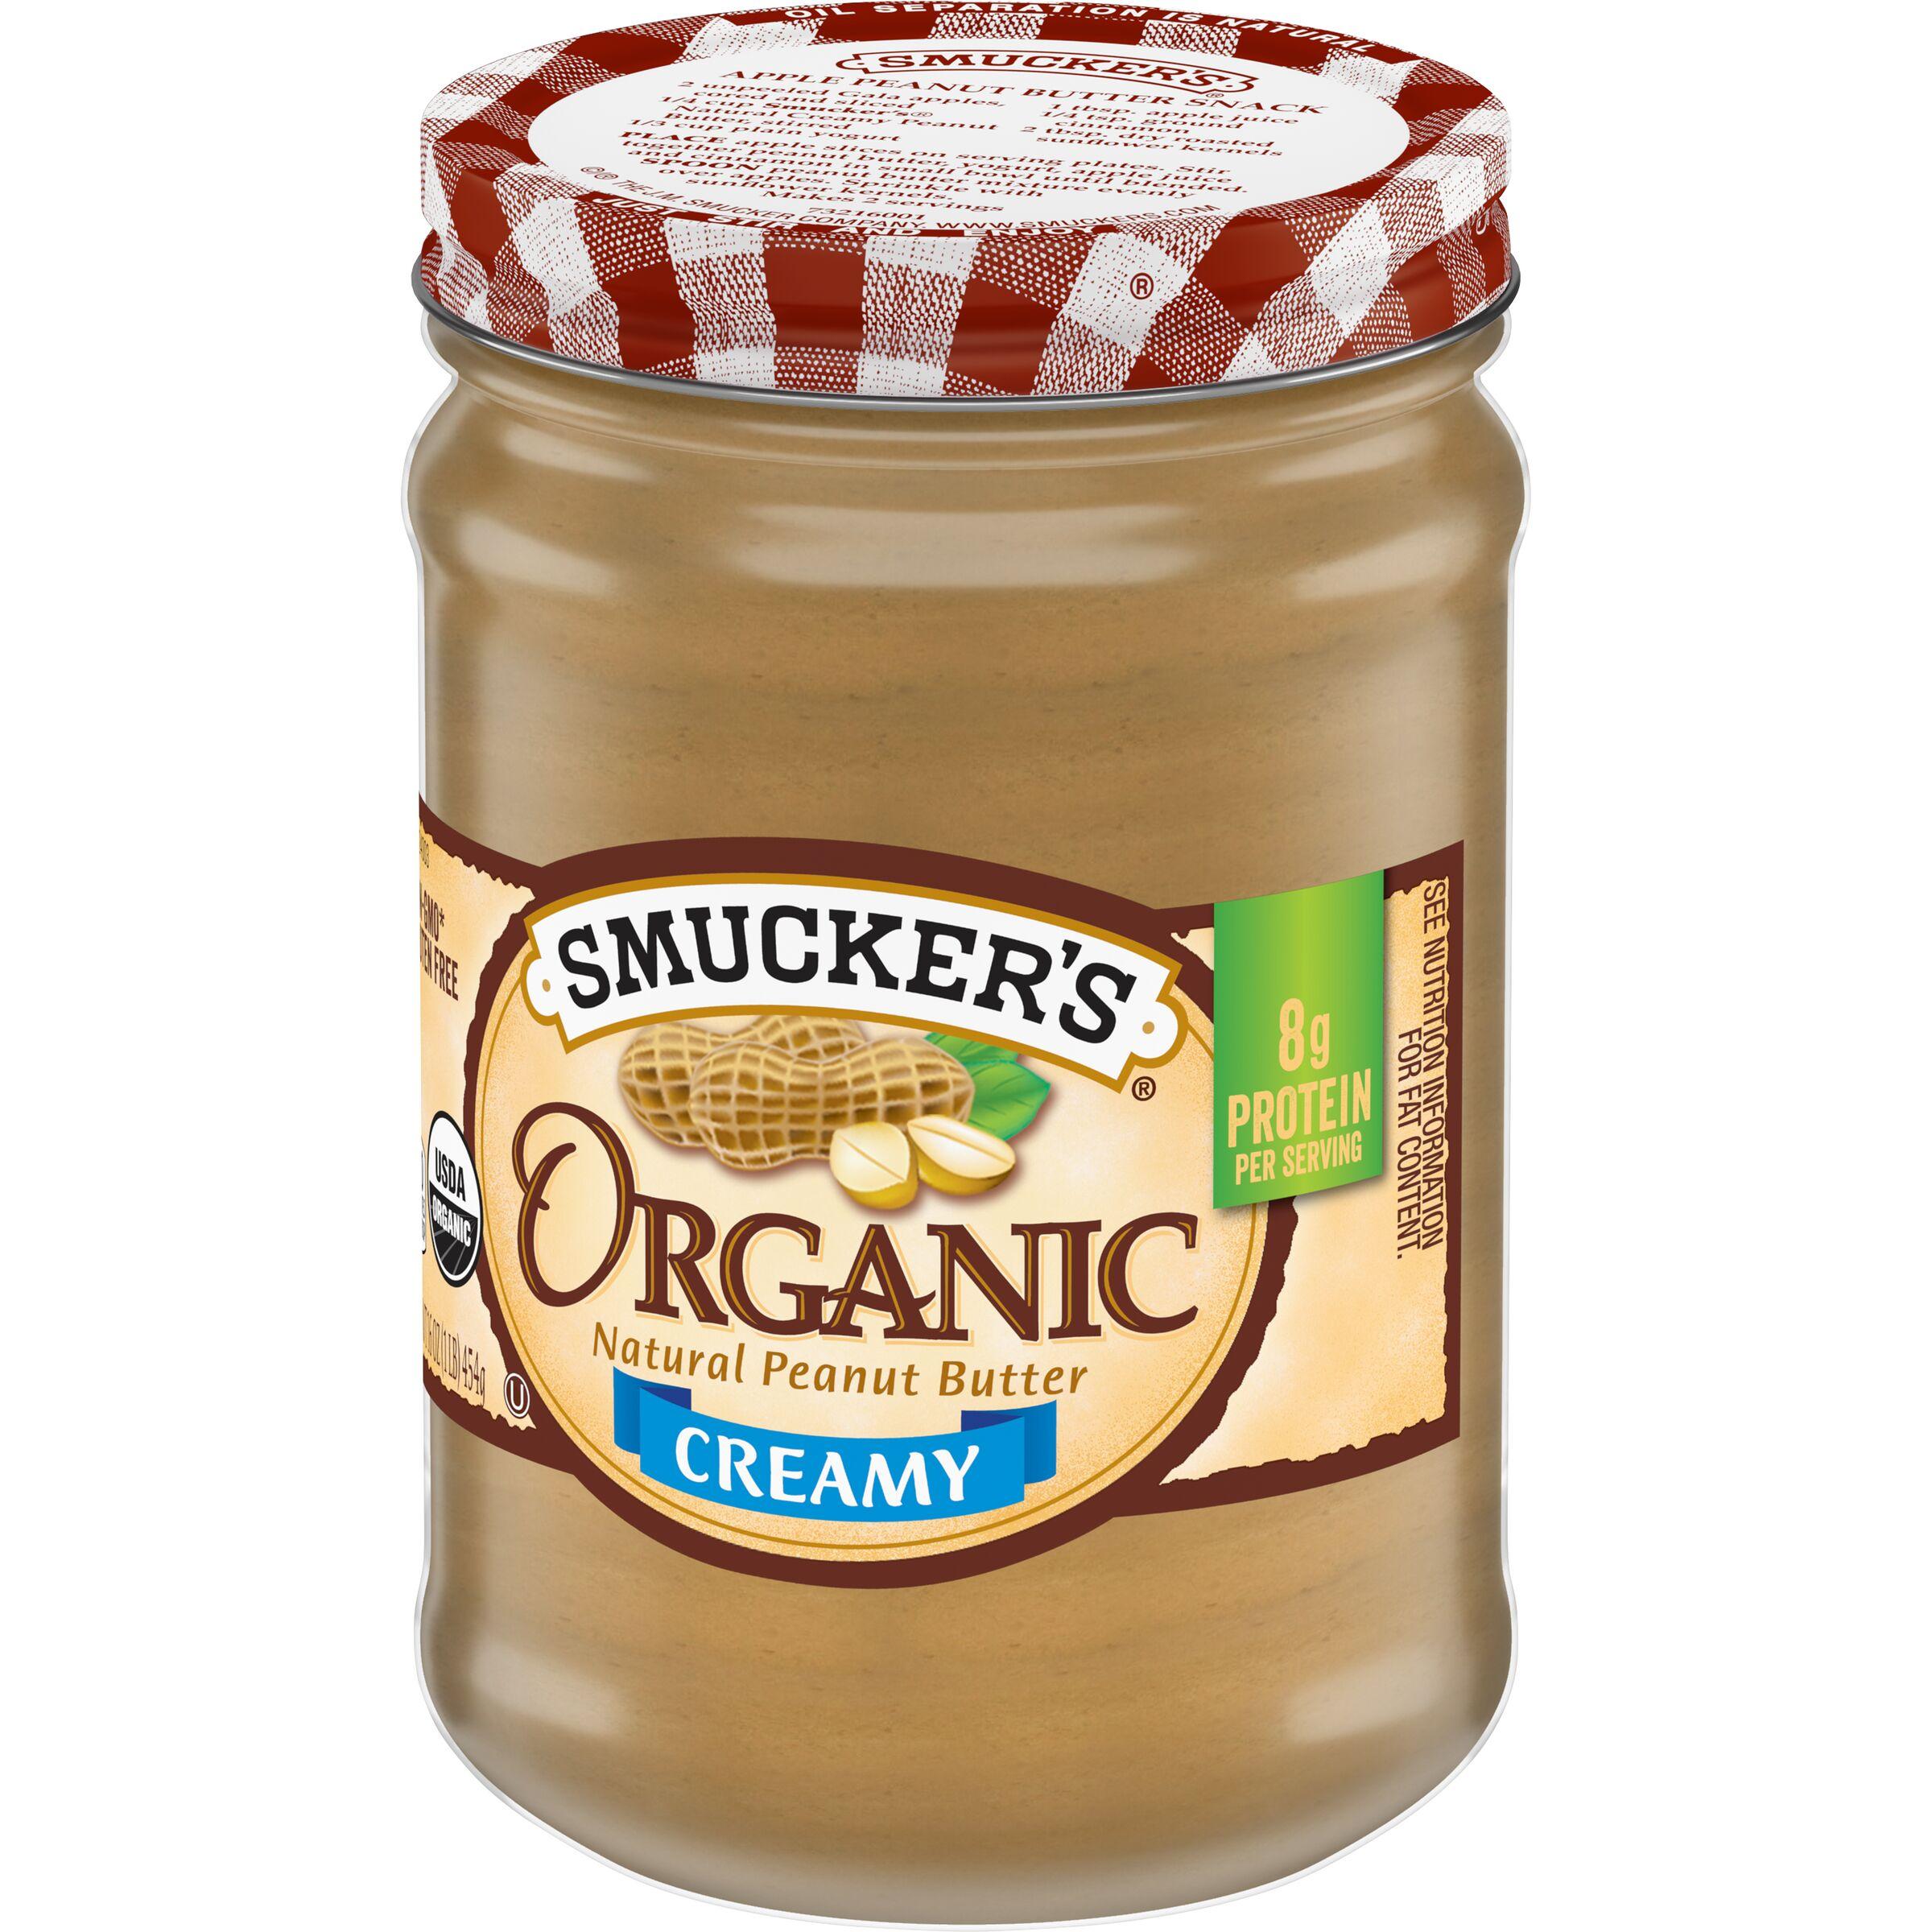 Smucker's  Organic Creamy Natural Peanut Butter